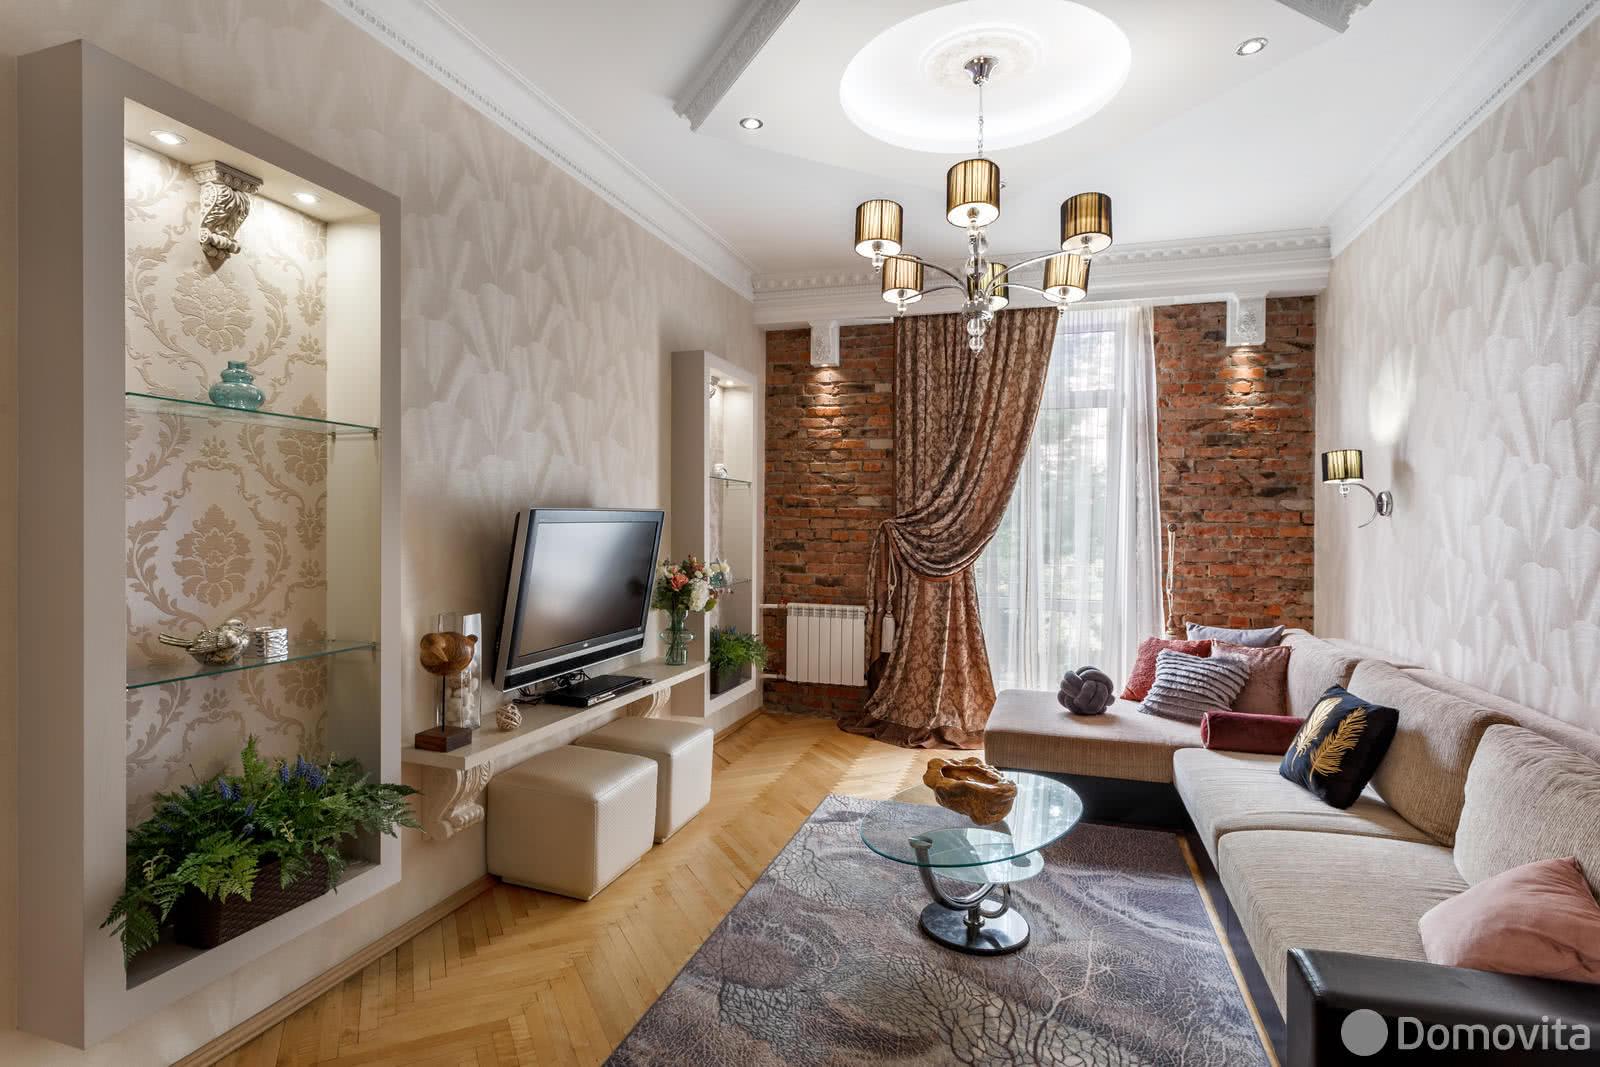 Аренда 2-комнатной квартиры на сутки в Минске ул. Красная, д. 18 - фото 1